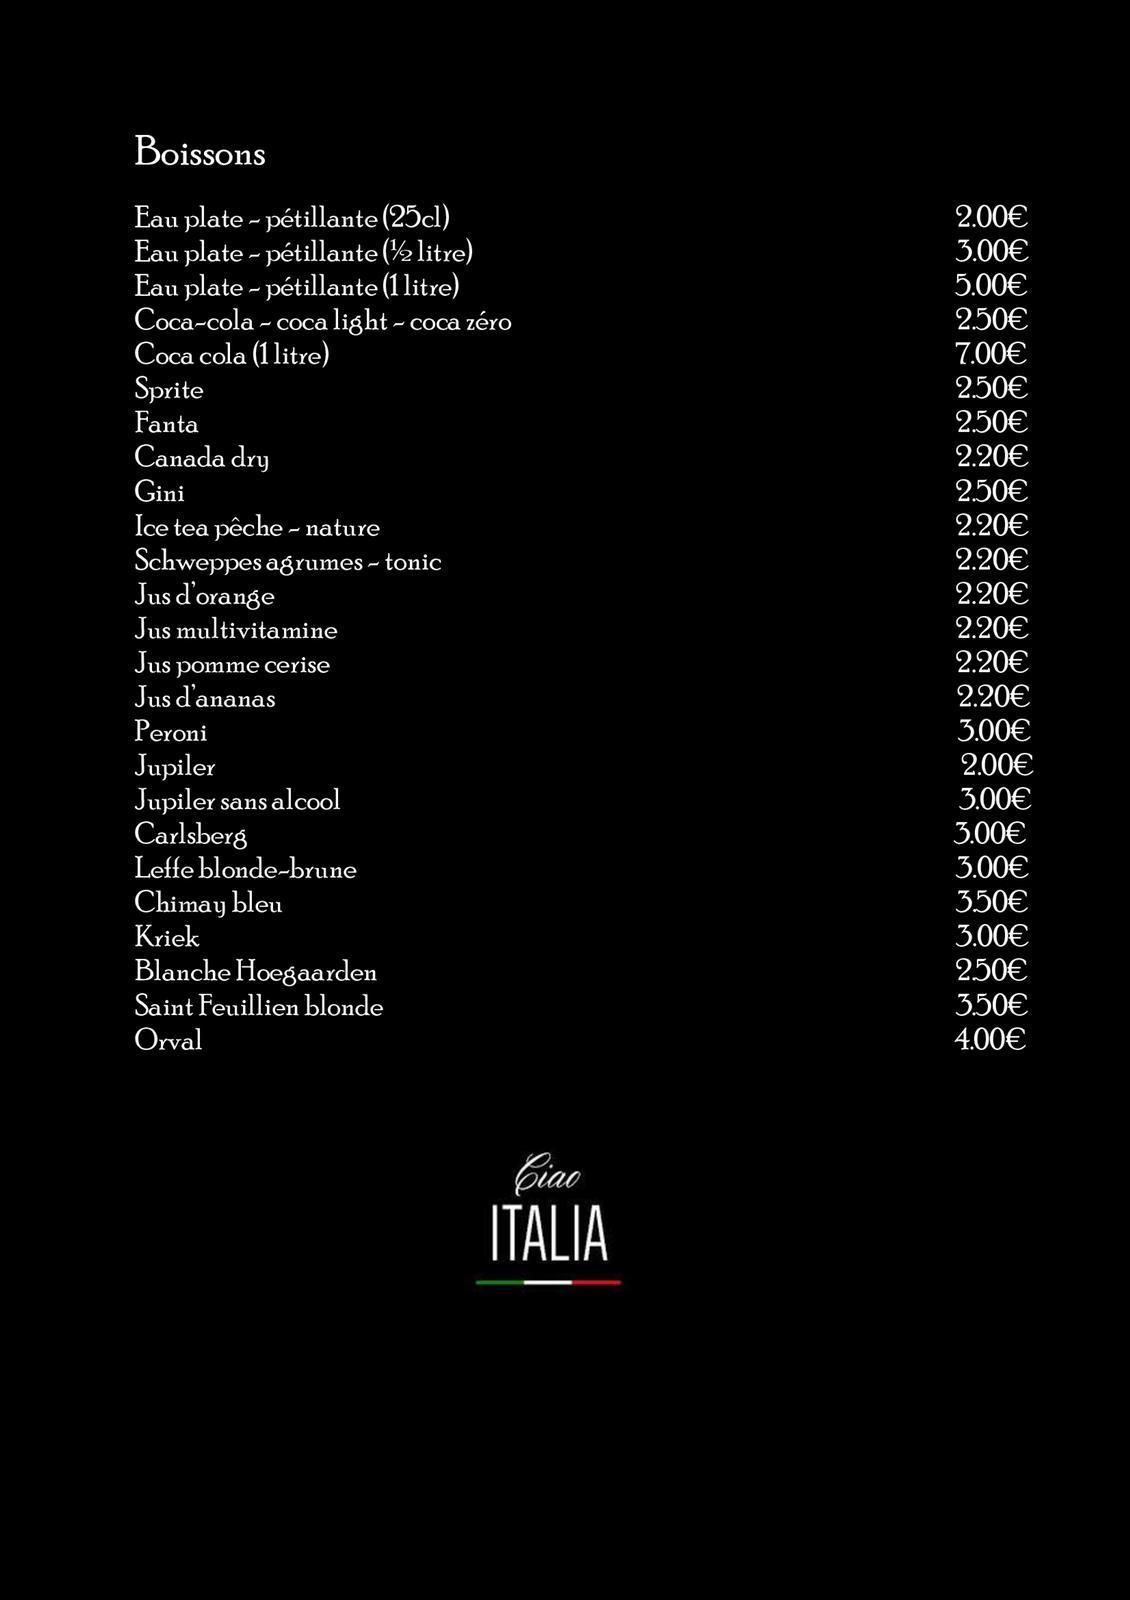 carte-ciaoitalia-302-boissons